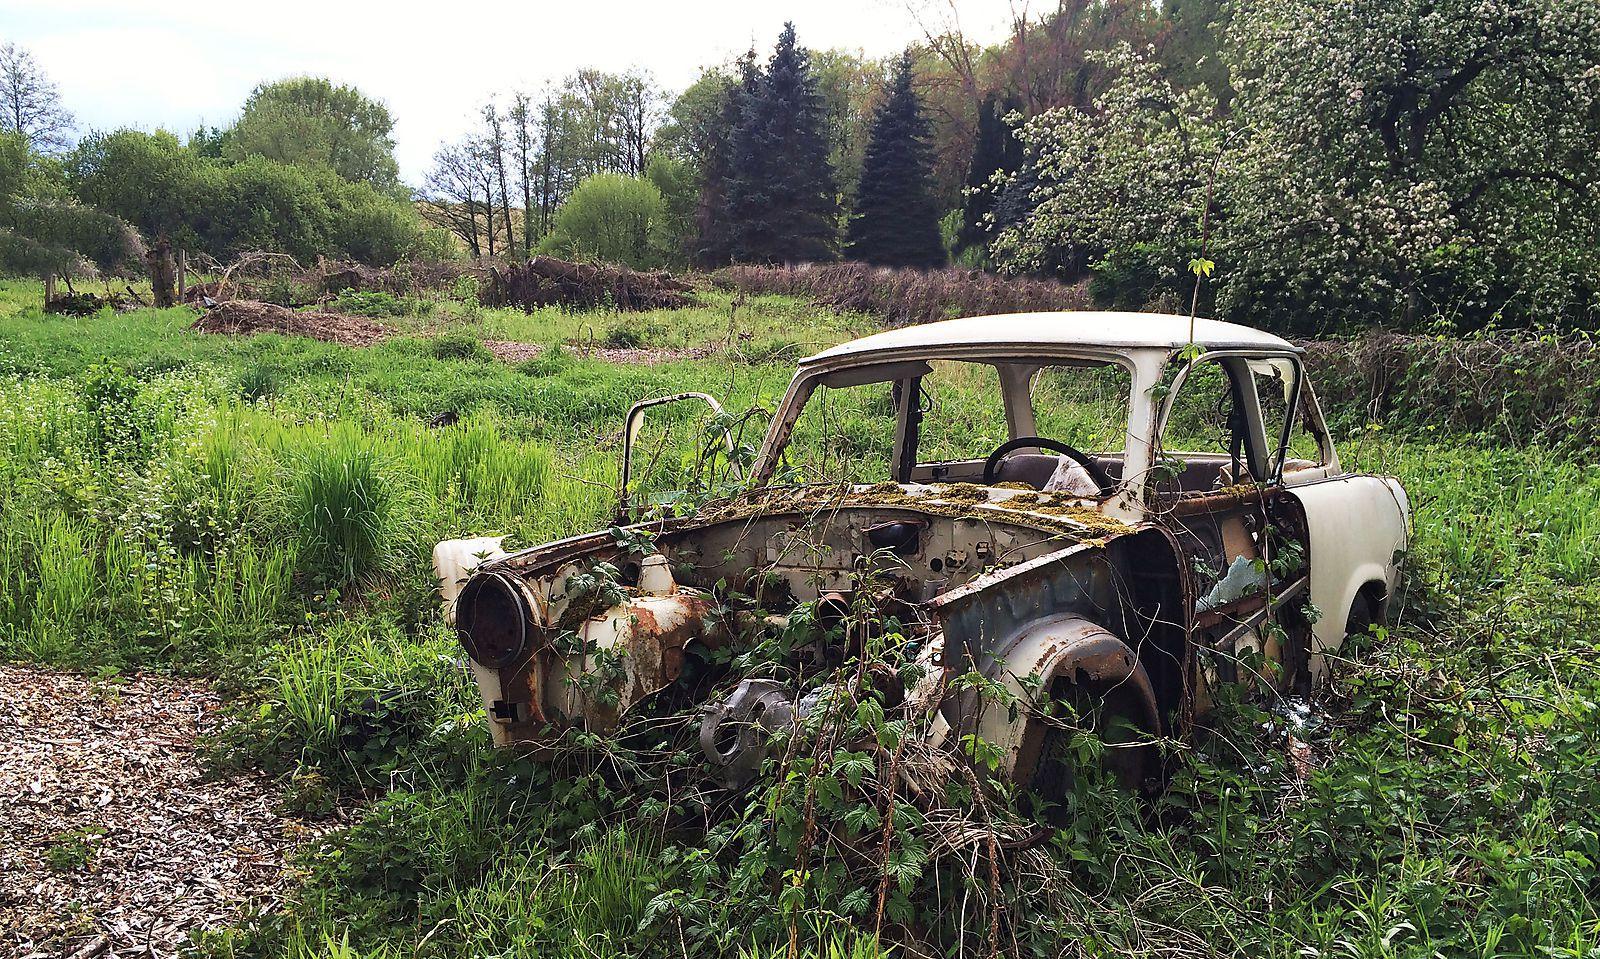 /images/uploads/c/c/8/5680328/Wreck-of-an-old-DDR-car-on-a-lawn_1567004999804520_v0_h.jpg